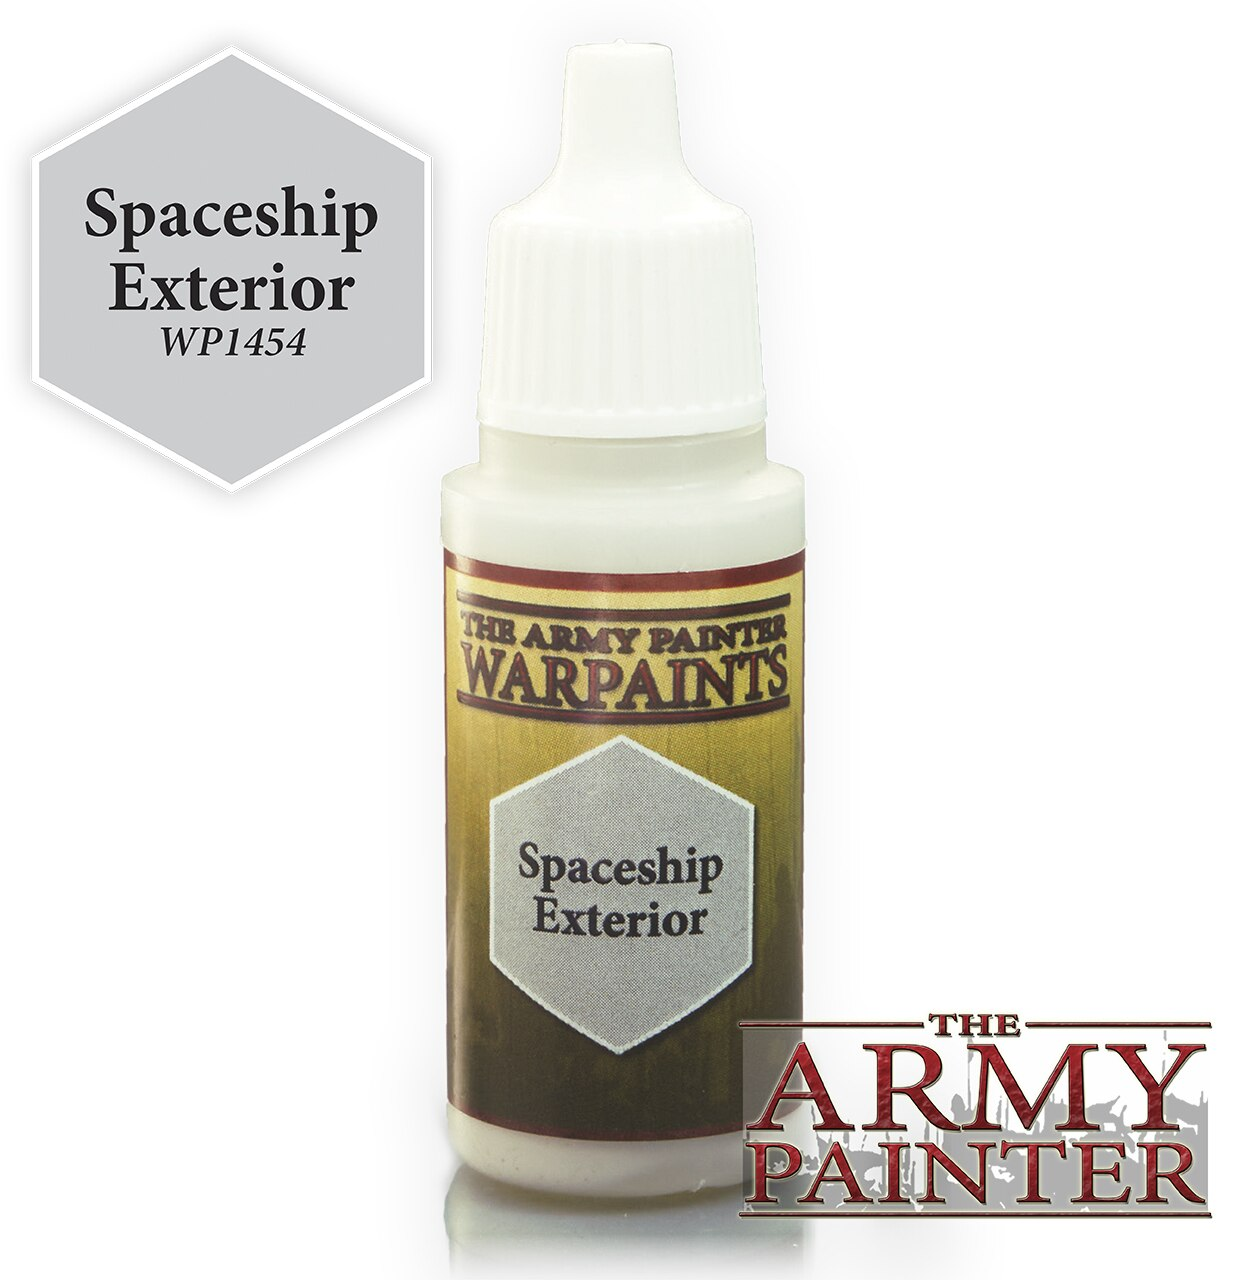 Army Painter Warpaint - Spaceship Exterior